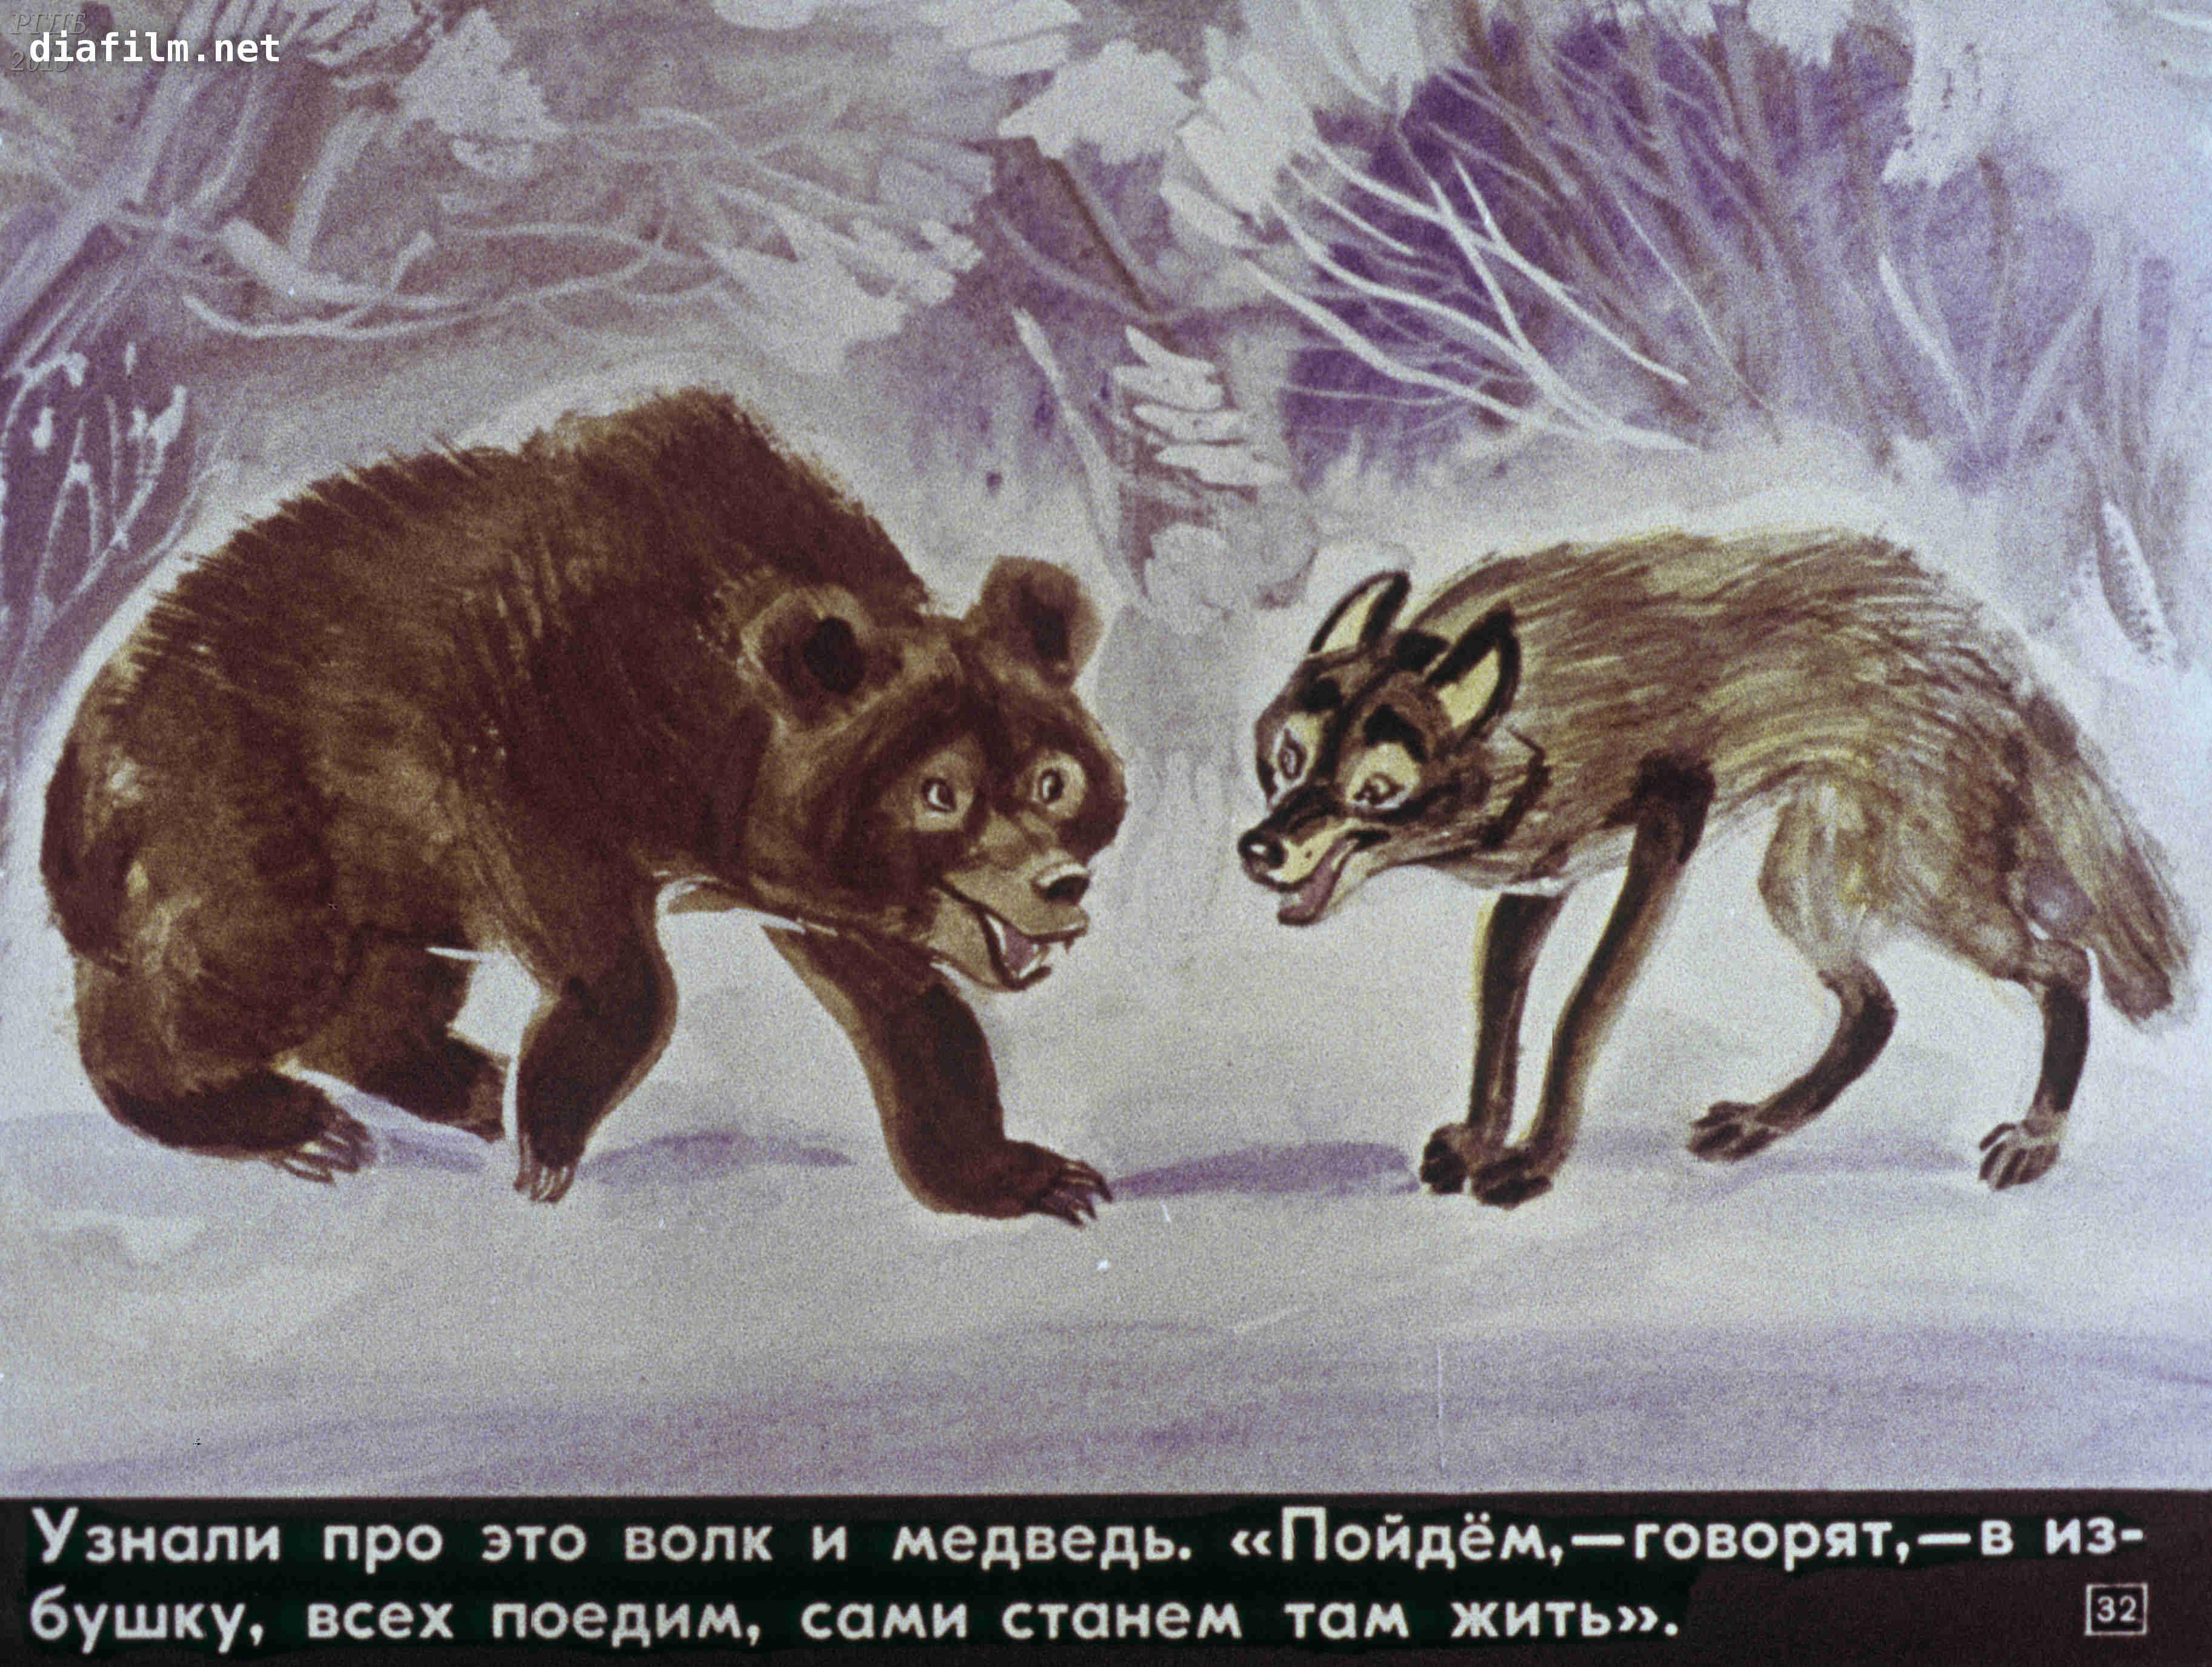 http://s4.uploads.ru/MnqeG.jpg